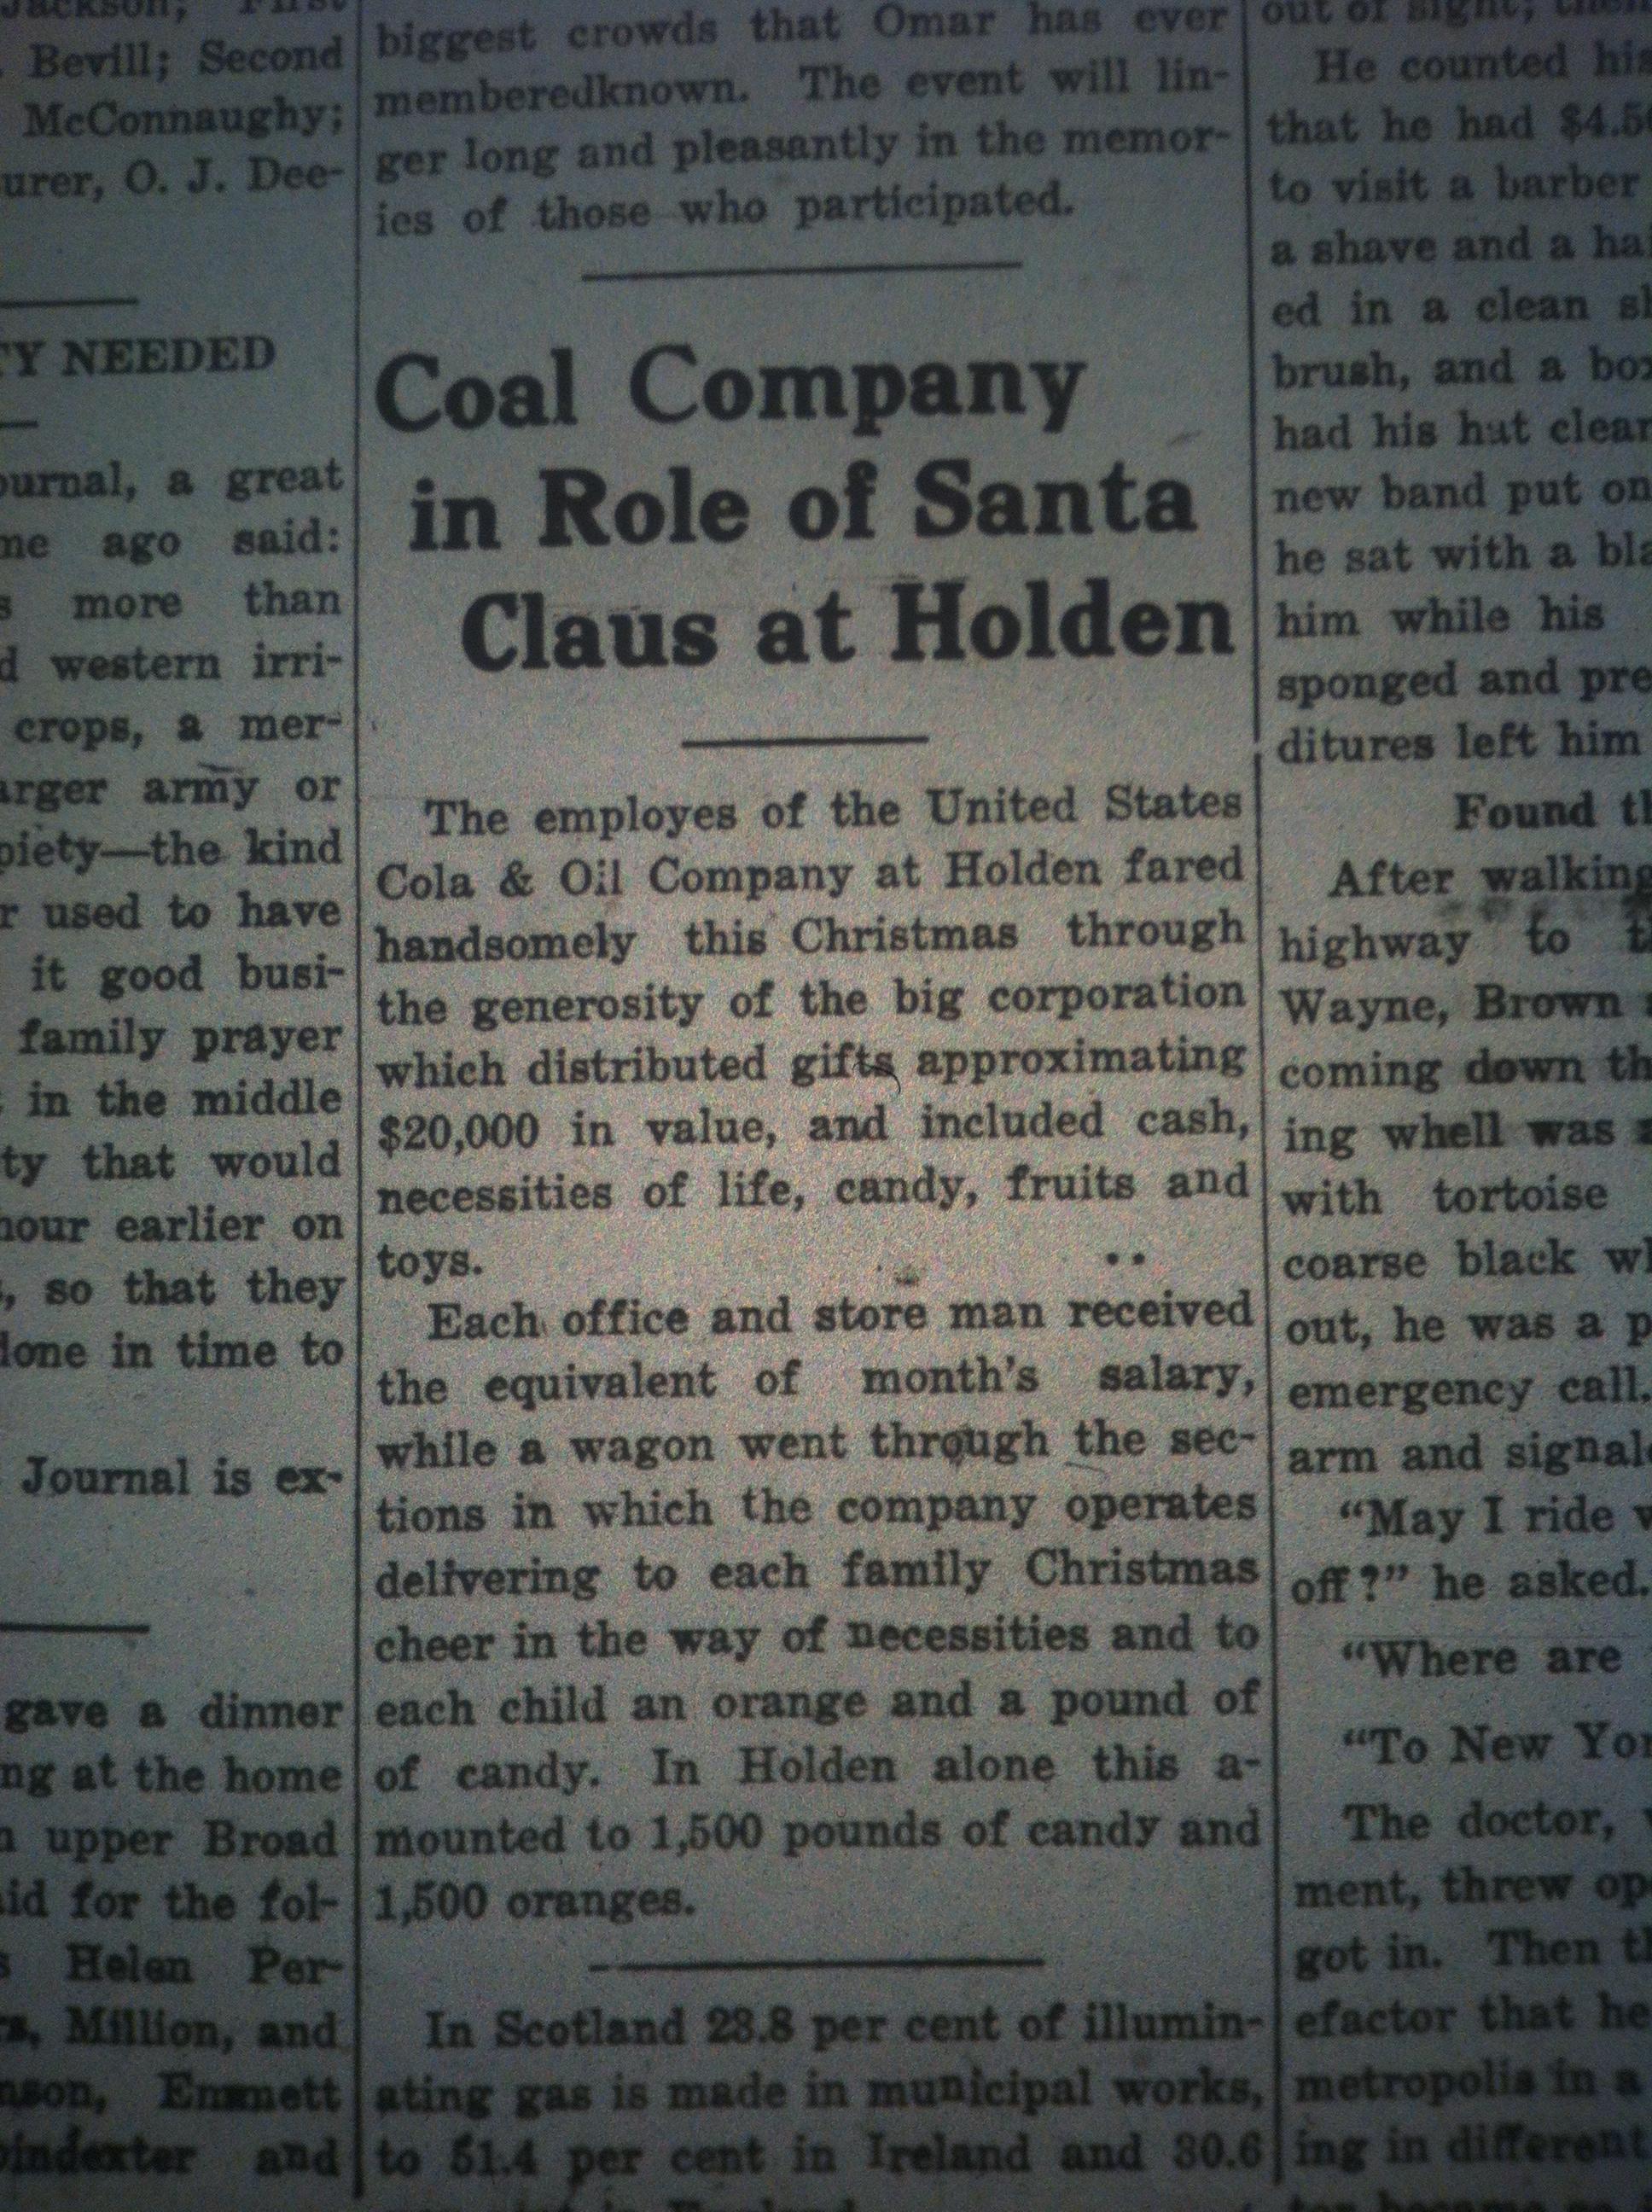 Coal Company Plays Role of Santa LD 12.28.1916.JPG